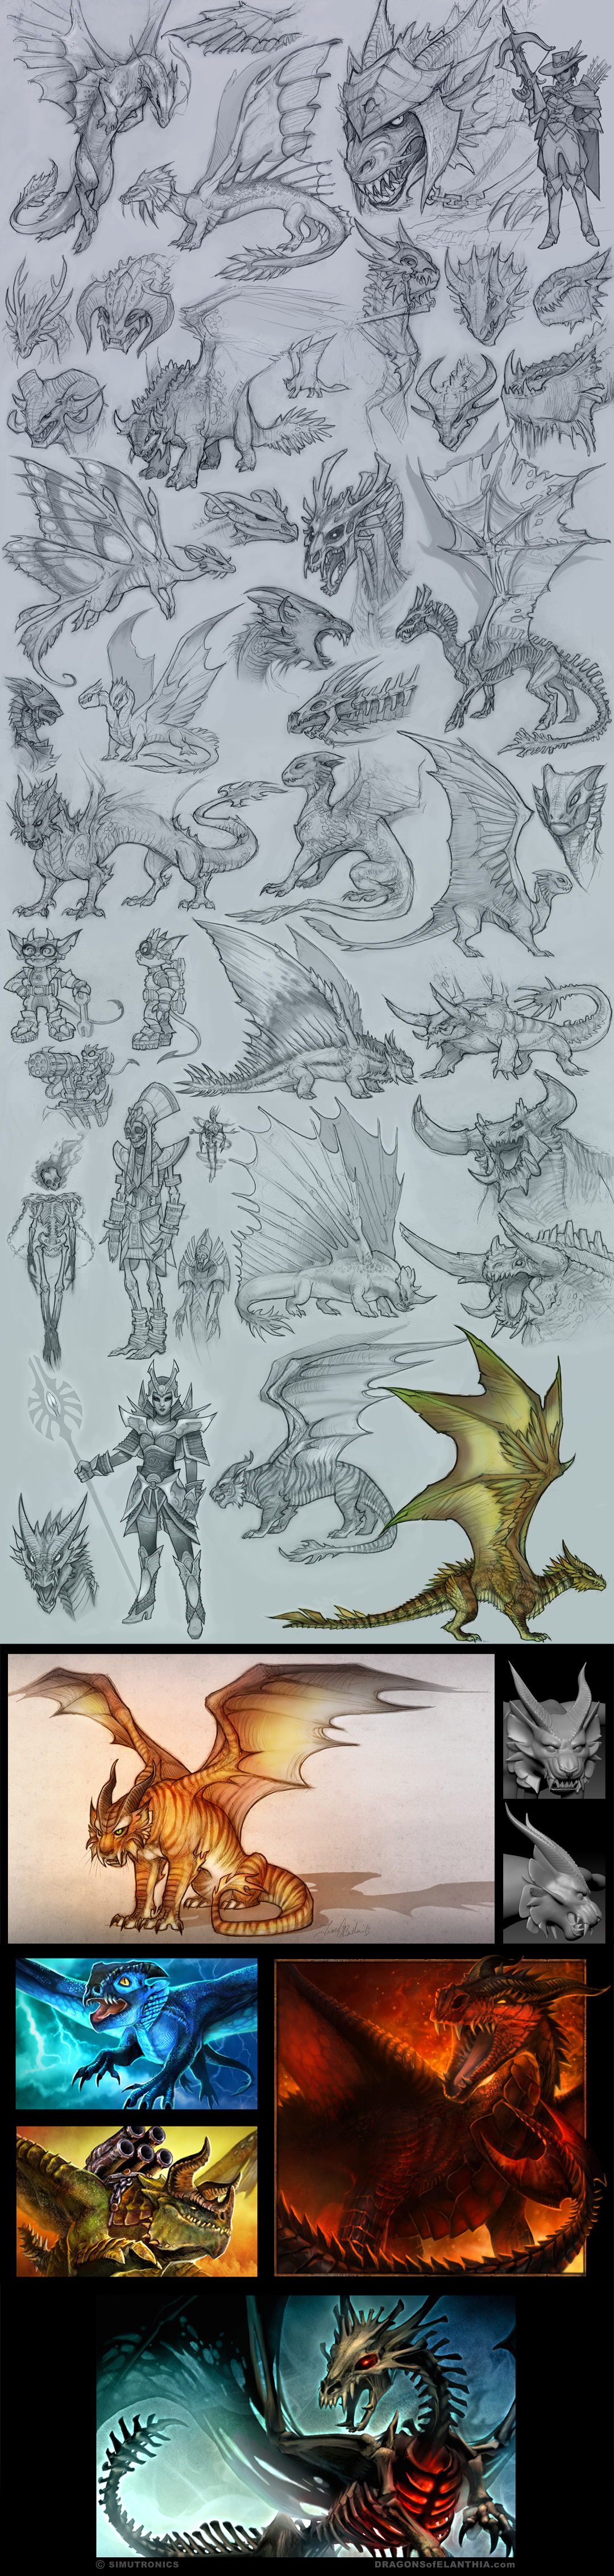 Dragons Dragons Dragons by tracyjb